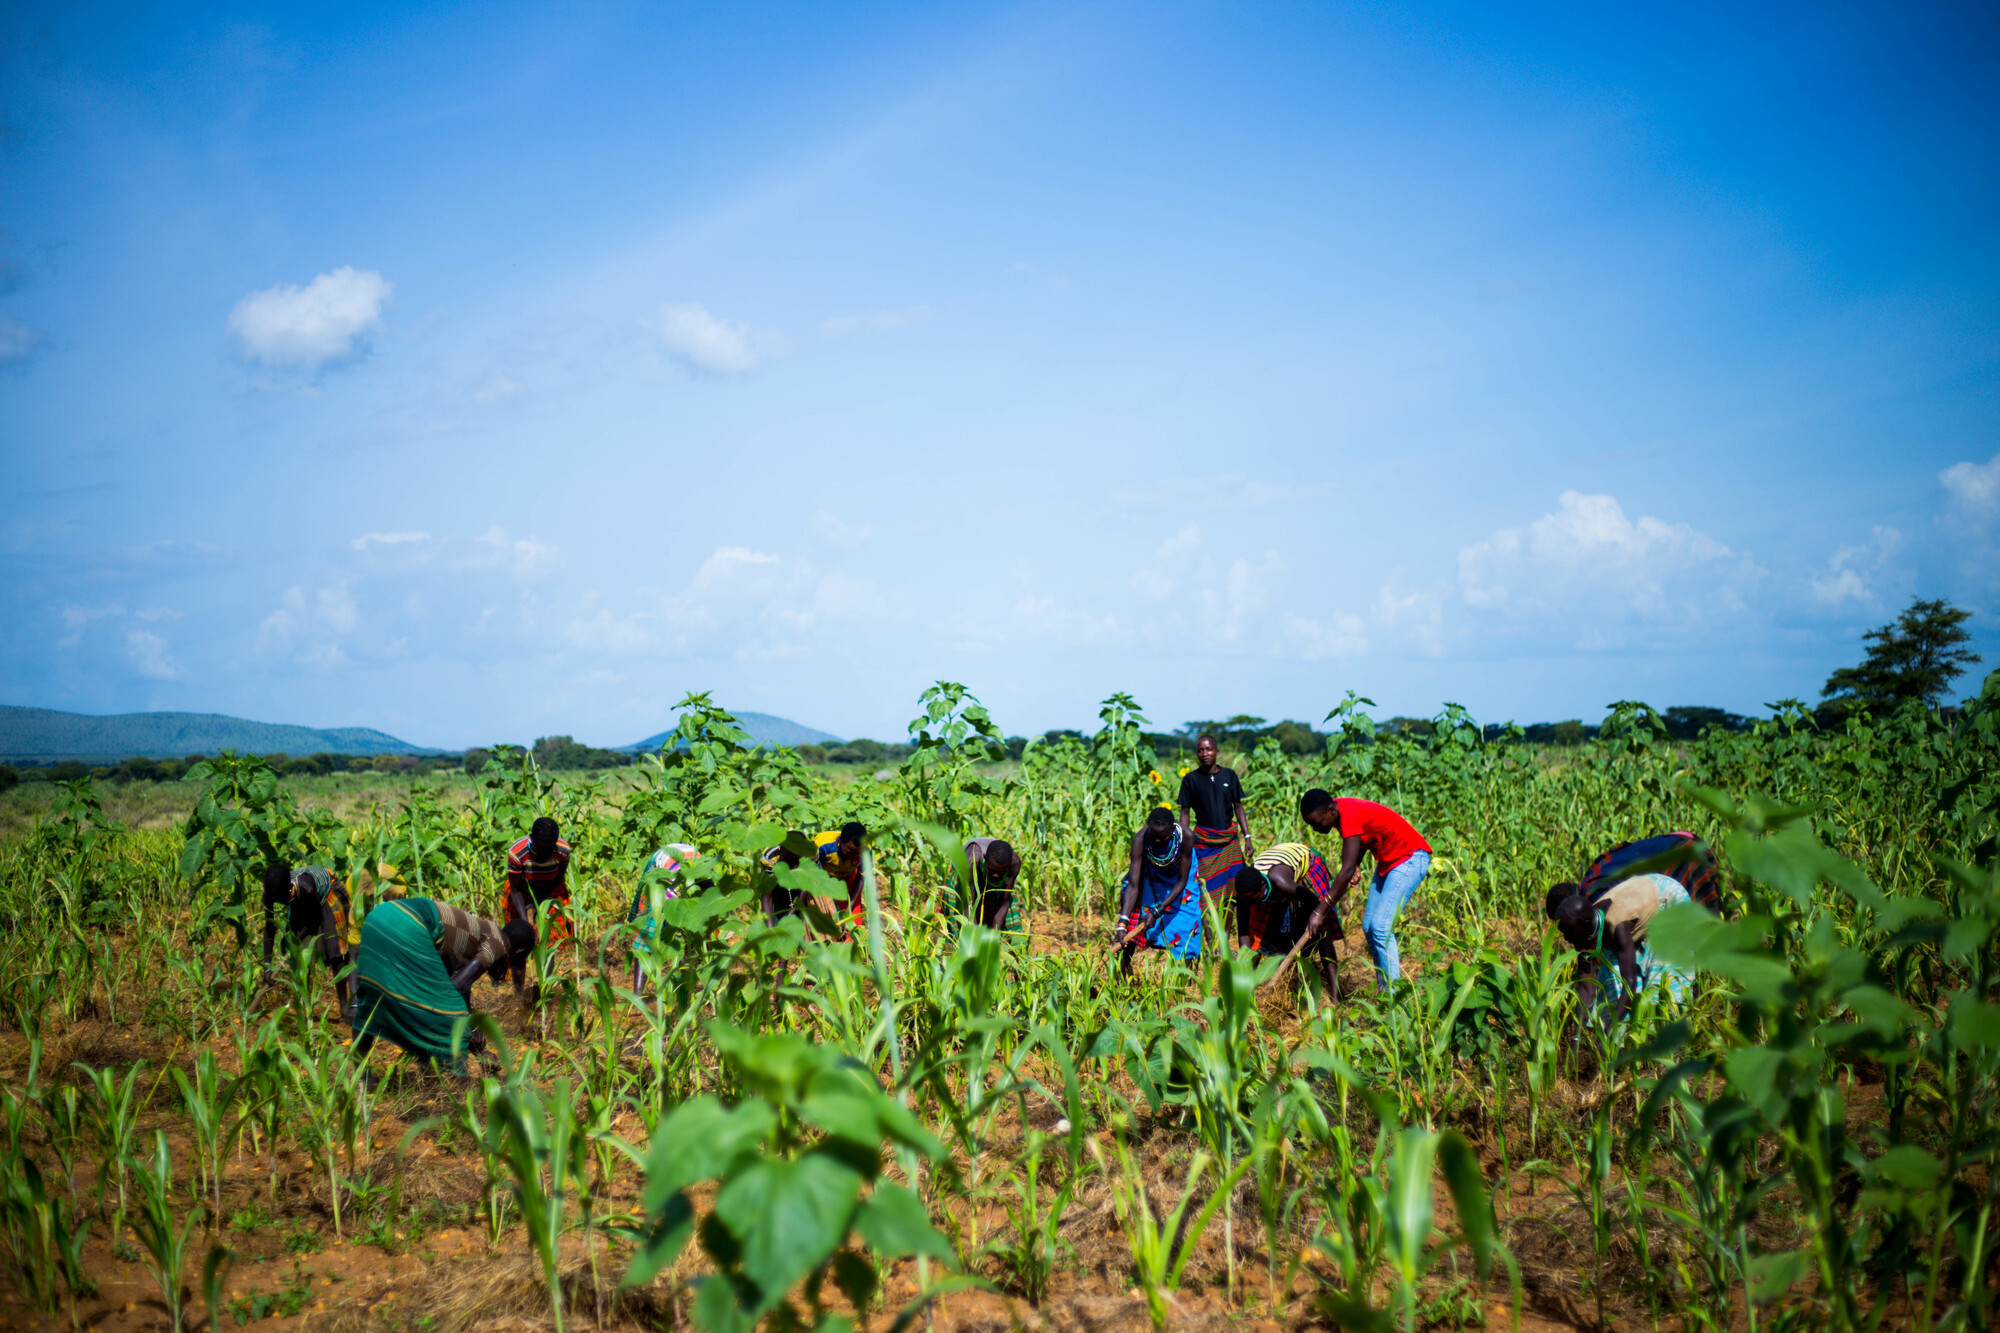 Young people planting trees in the Karamoja District of Uganda